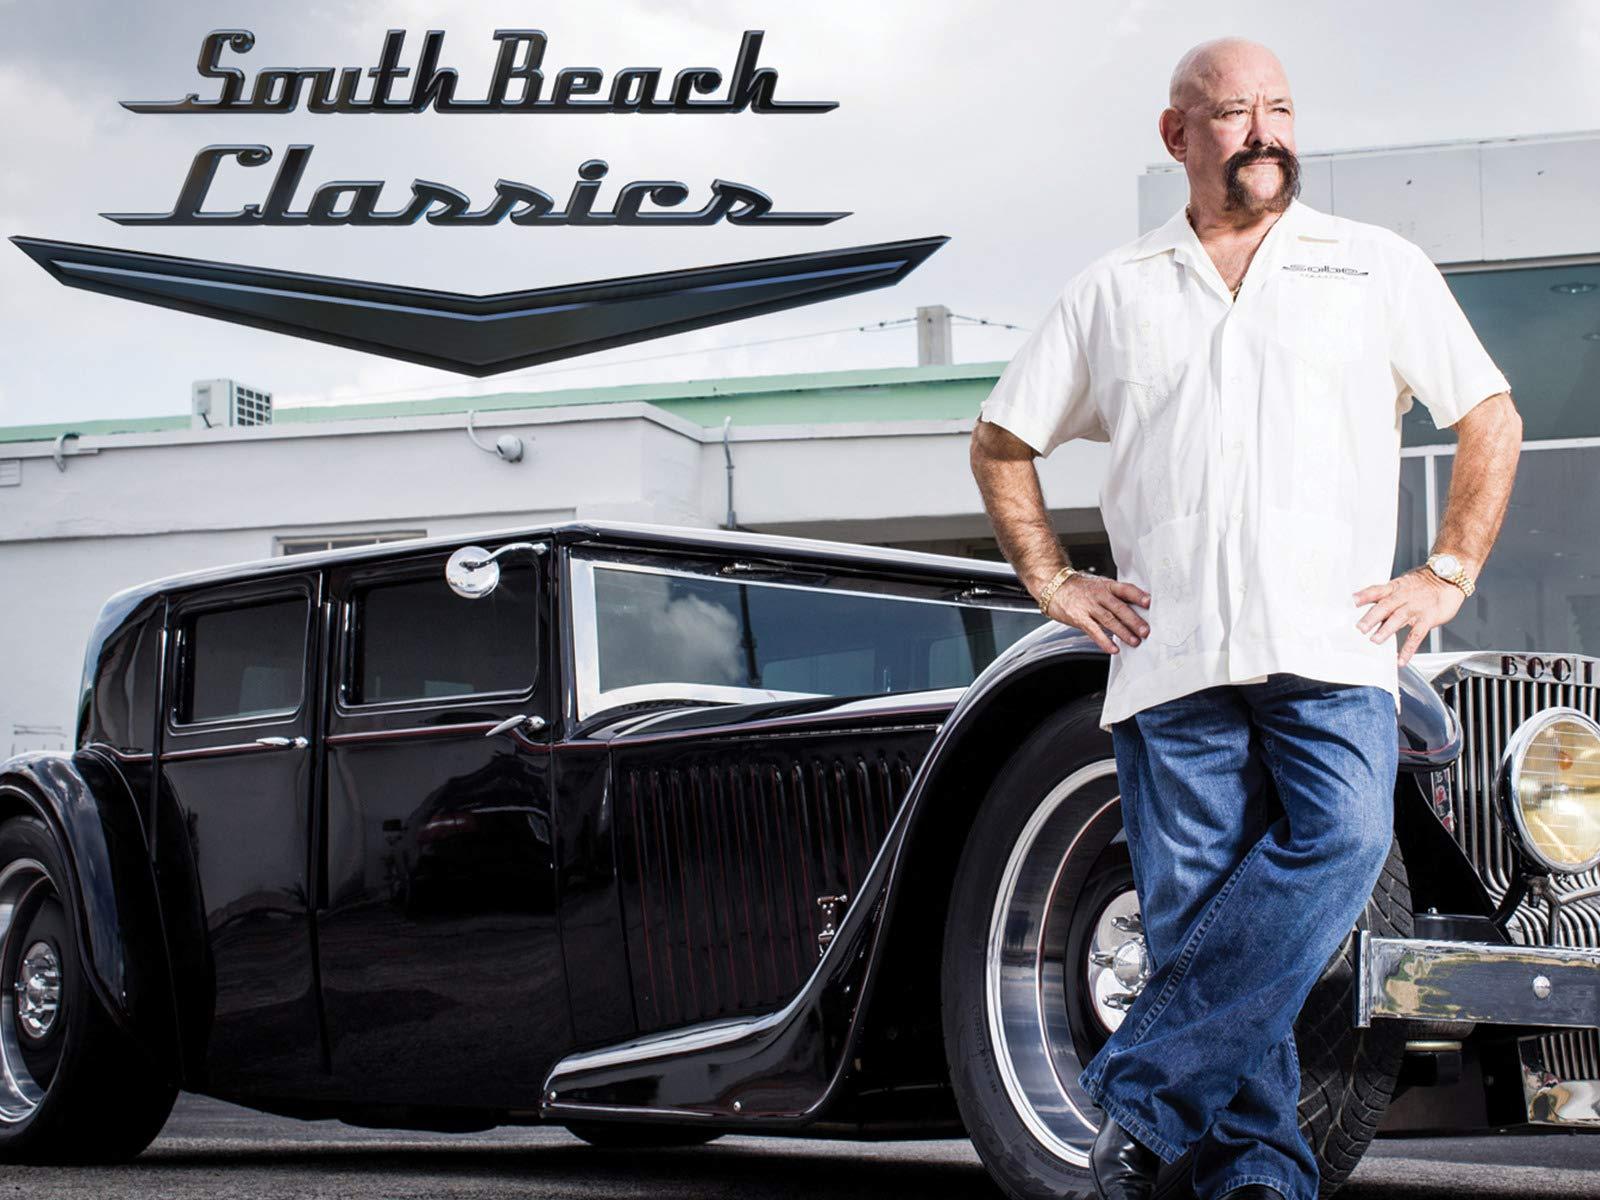 South Beach Classics - Season 4